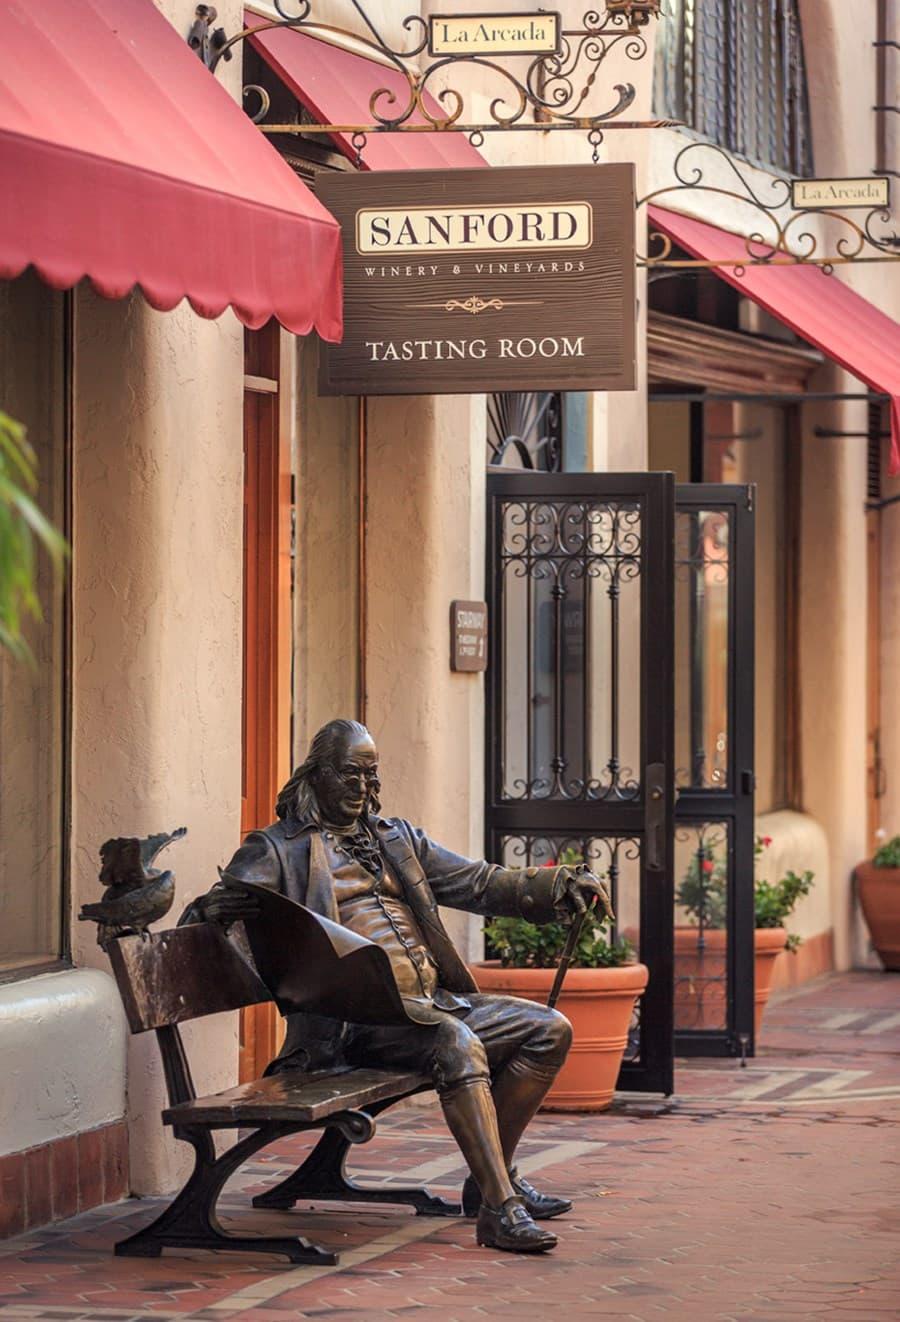 A gallery image (10978) of Sanford Santa Barbara from CellarPass